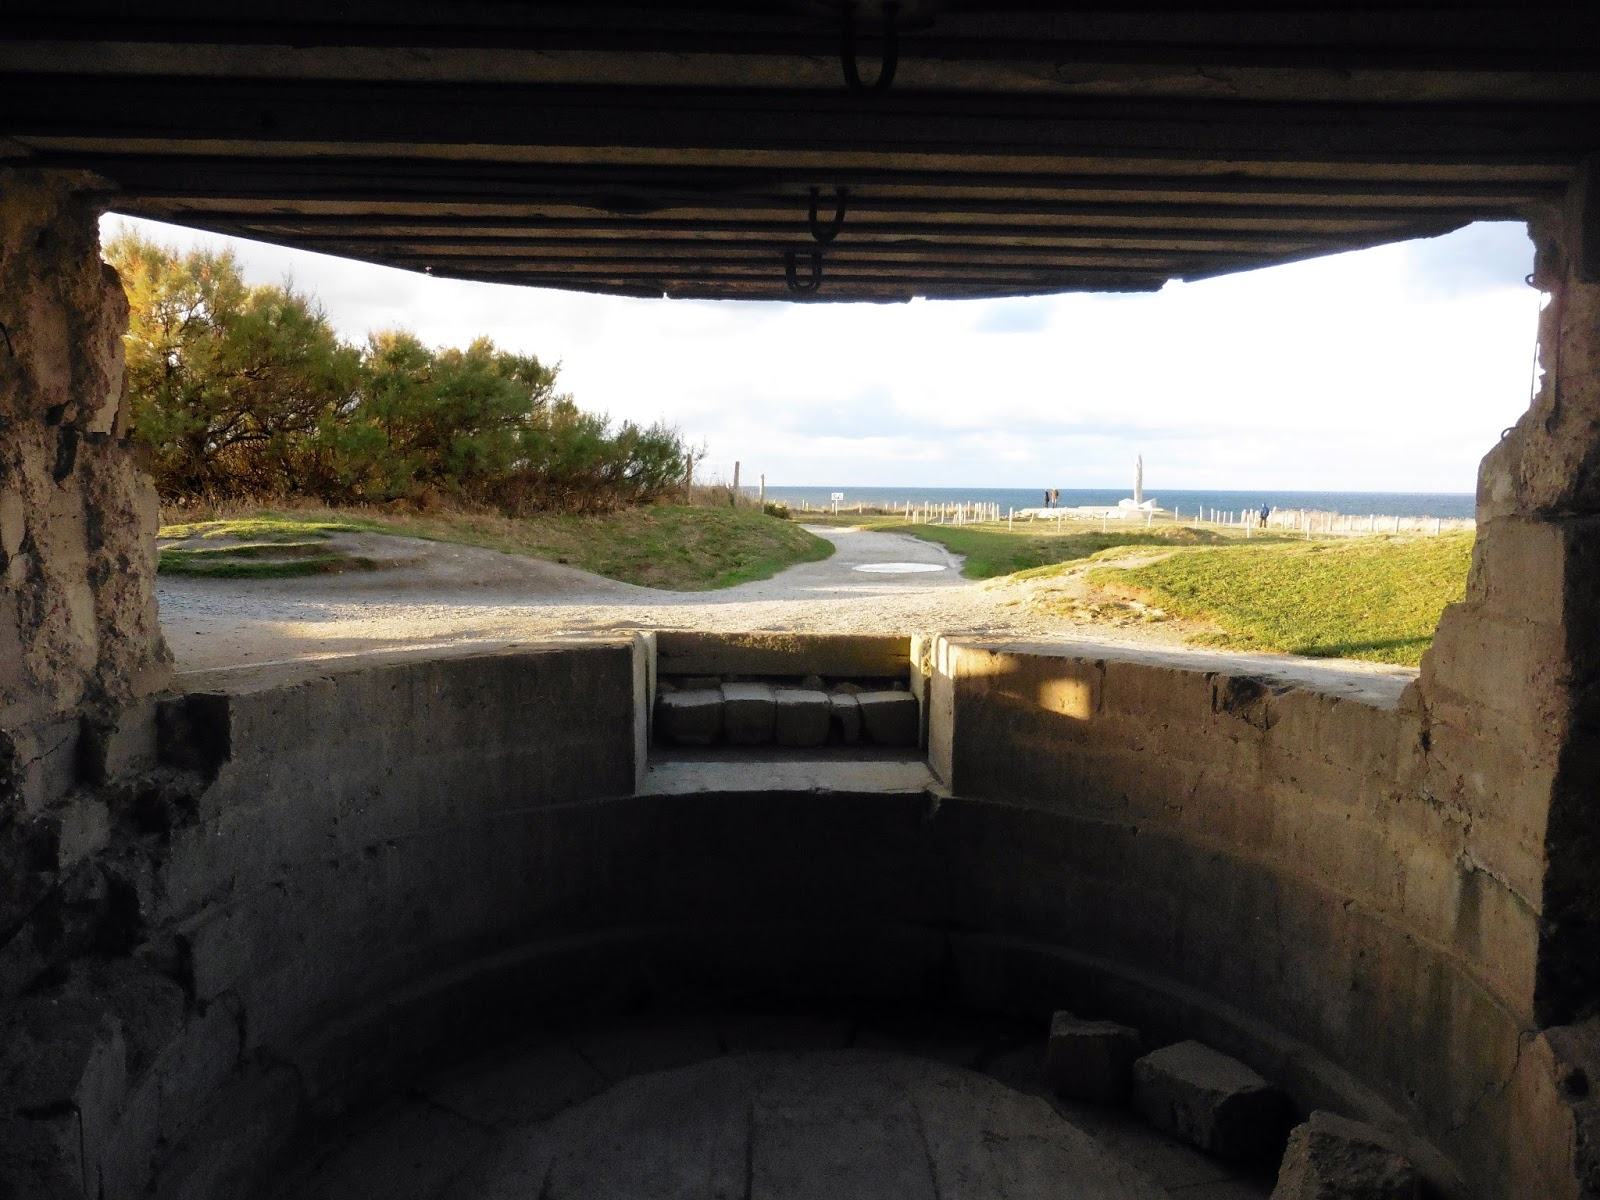 German bunker at Pointe du Hoc in Normandy, France